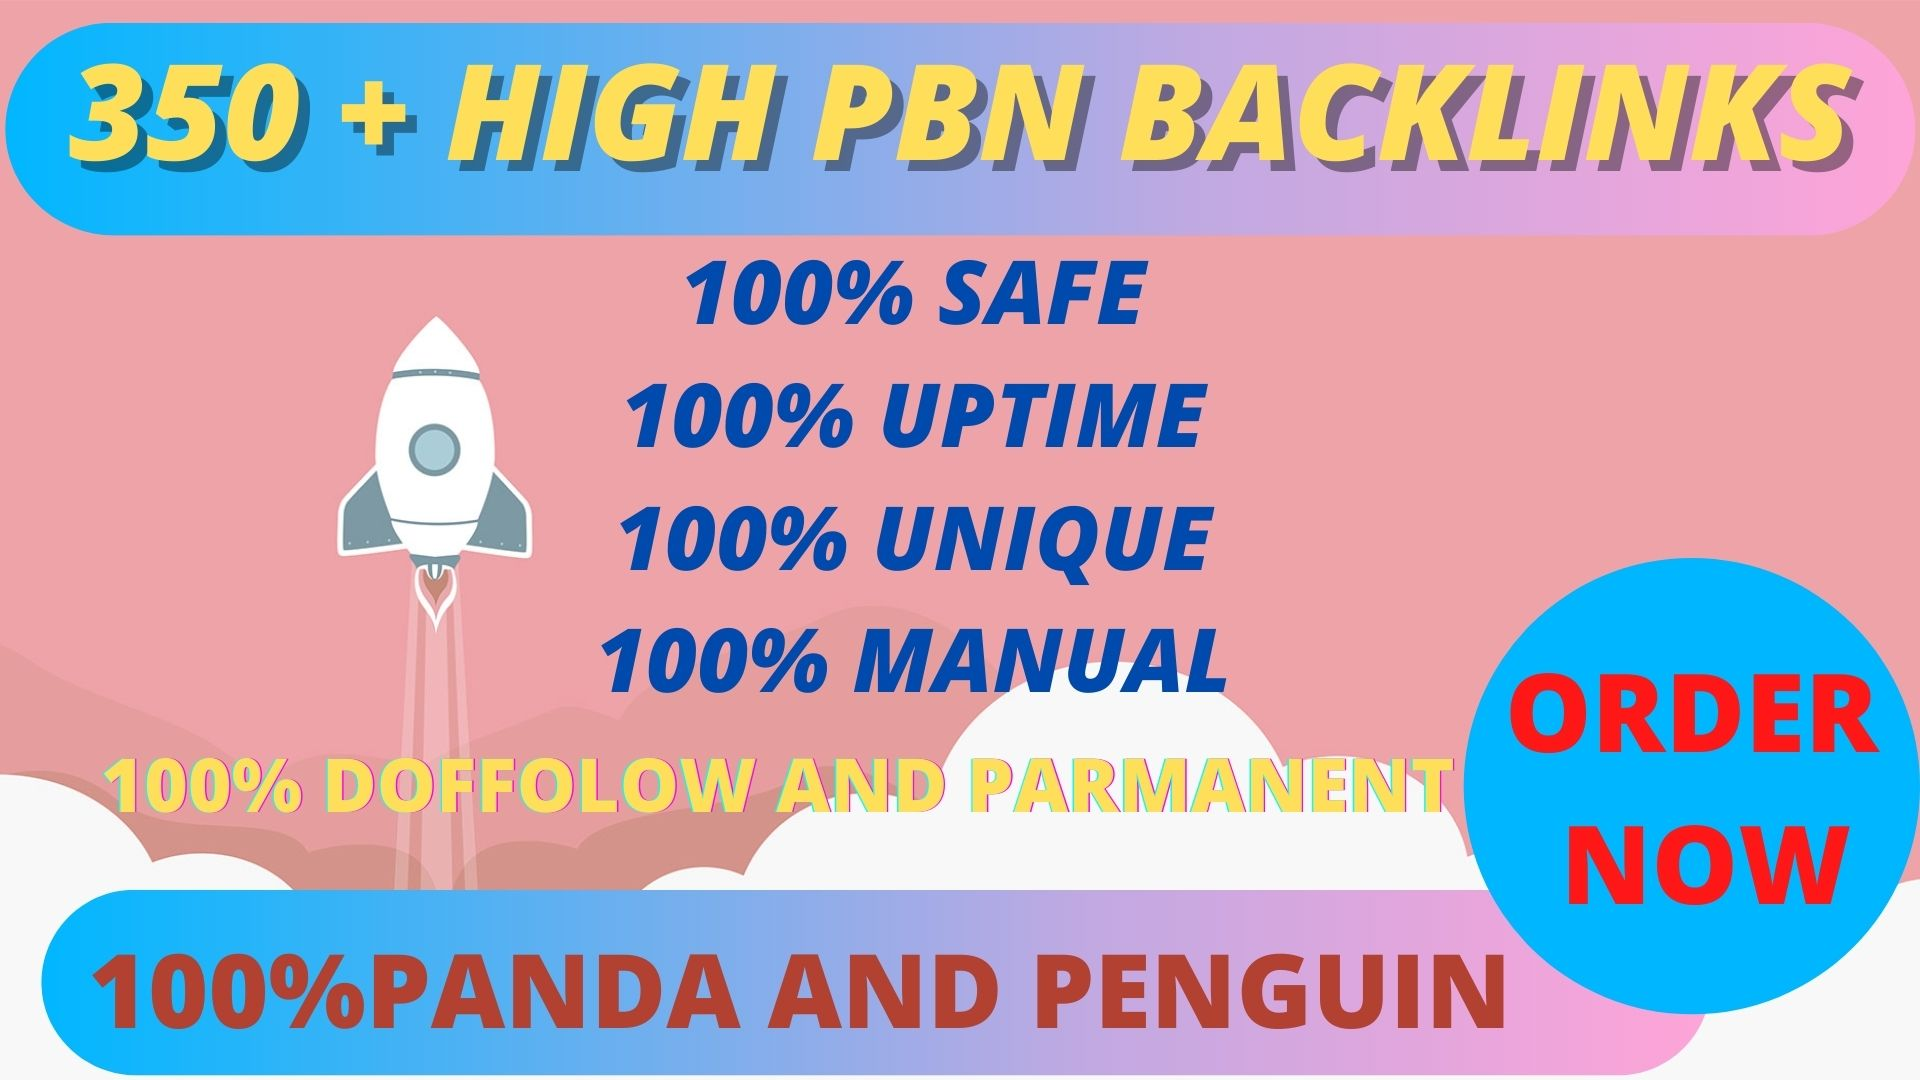 Get 350+ High DA 60+ PBN Backlink to Rank Your Website by better solution.